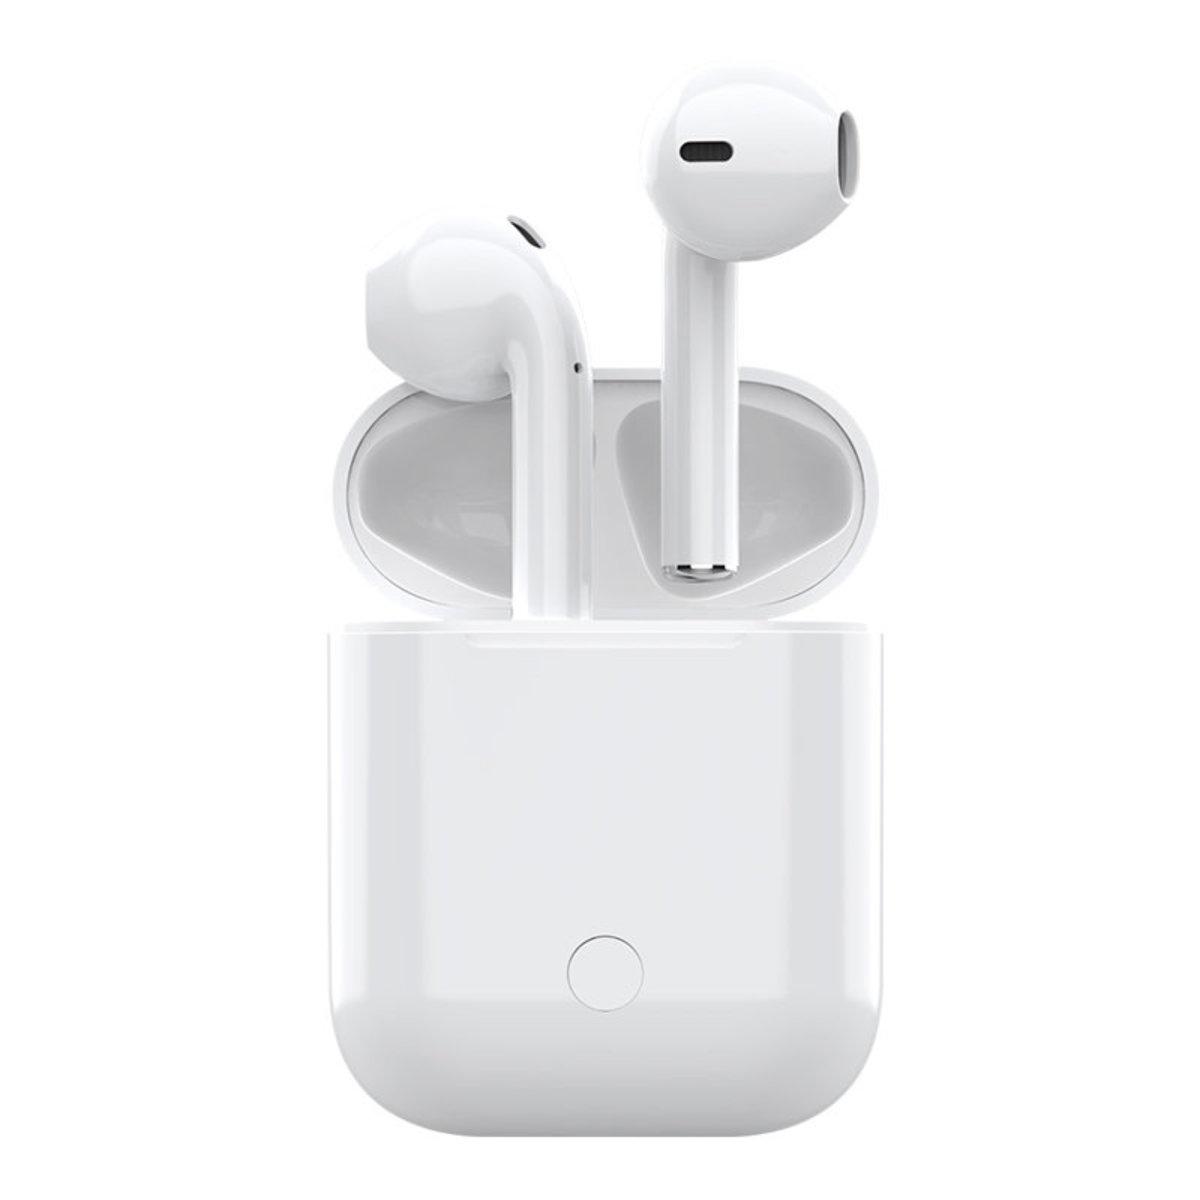 YB502 - 新款藍芽5.0 / 智能降噪高清通話 (雙耳款)